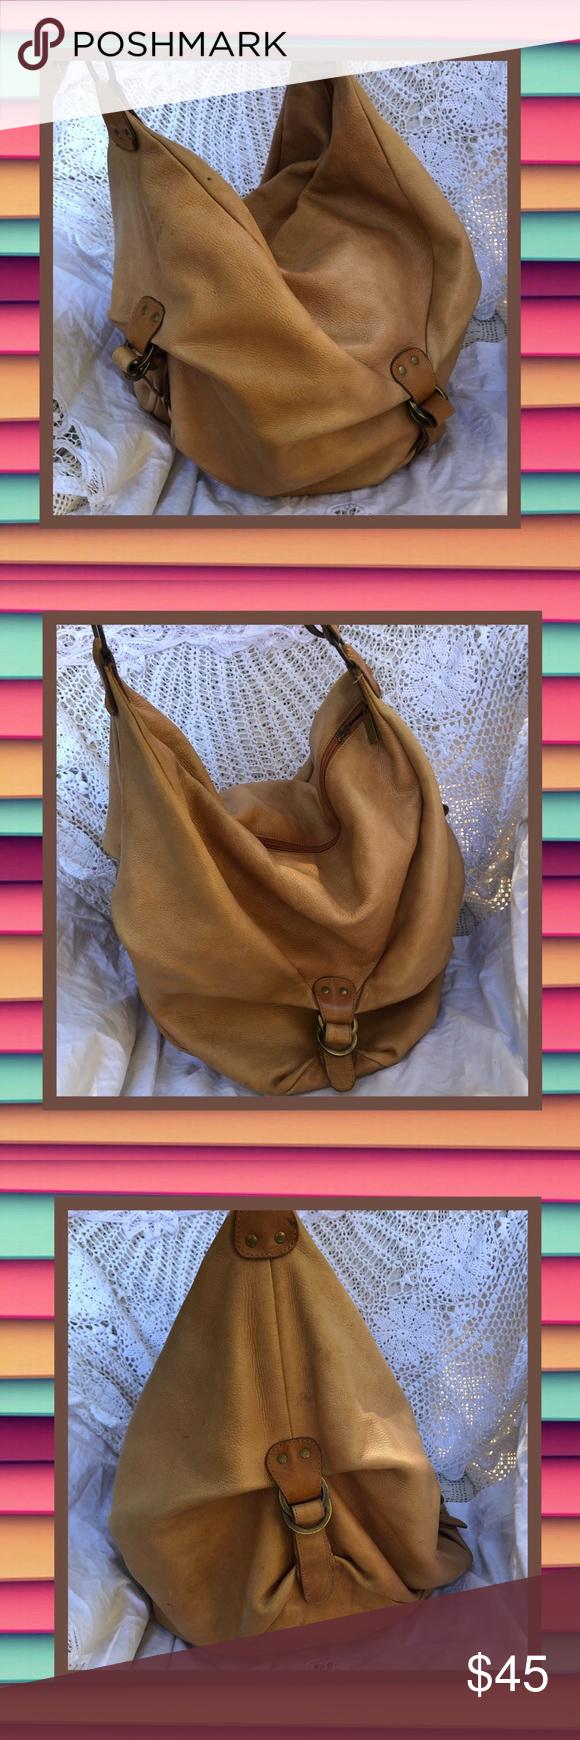 Helena de Natalia Huge Leather Hobo Bucket Purse This bag